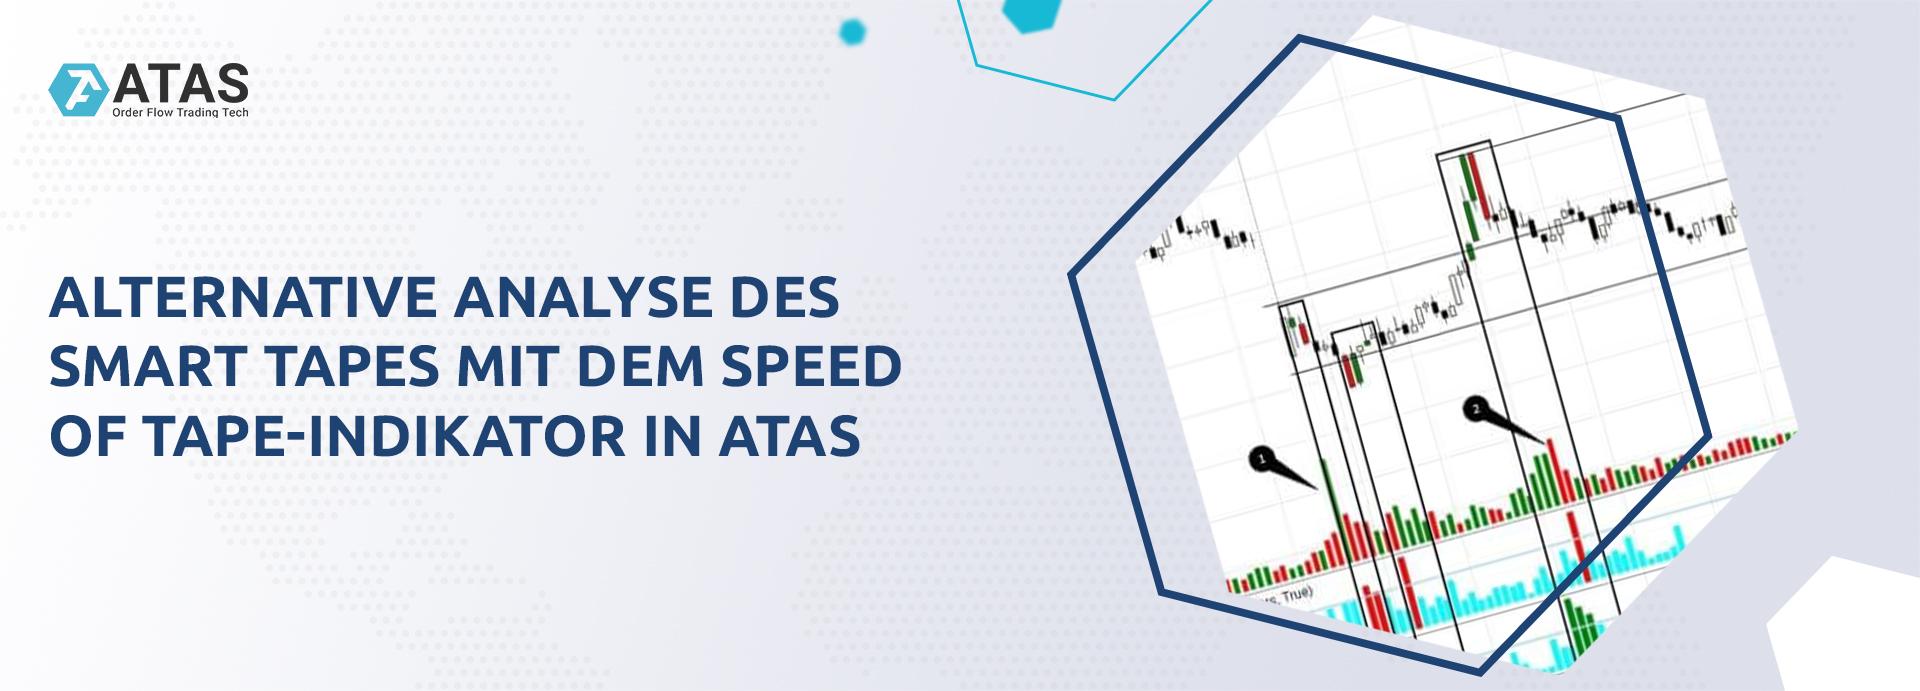 Alternative Analyse des Smart Tapes mit dem Speed of Tape-Indikator in ATAS